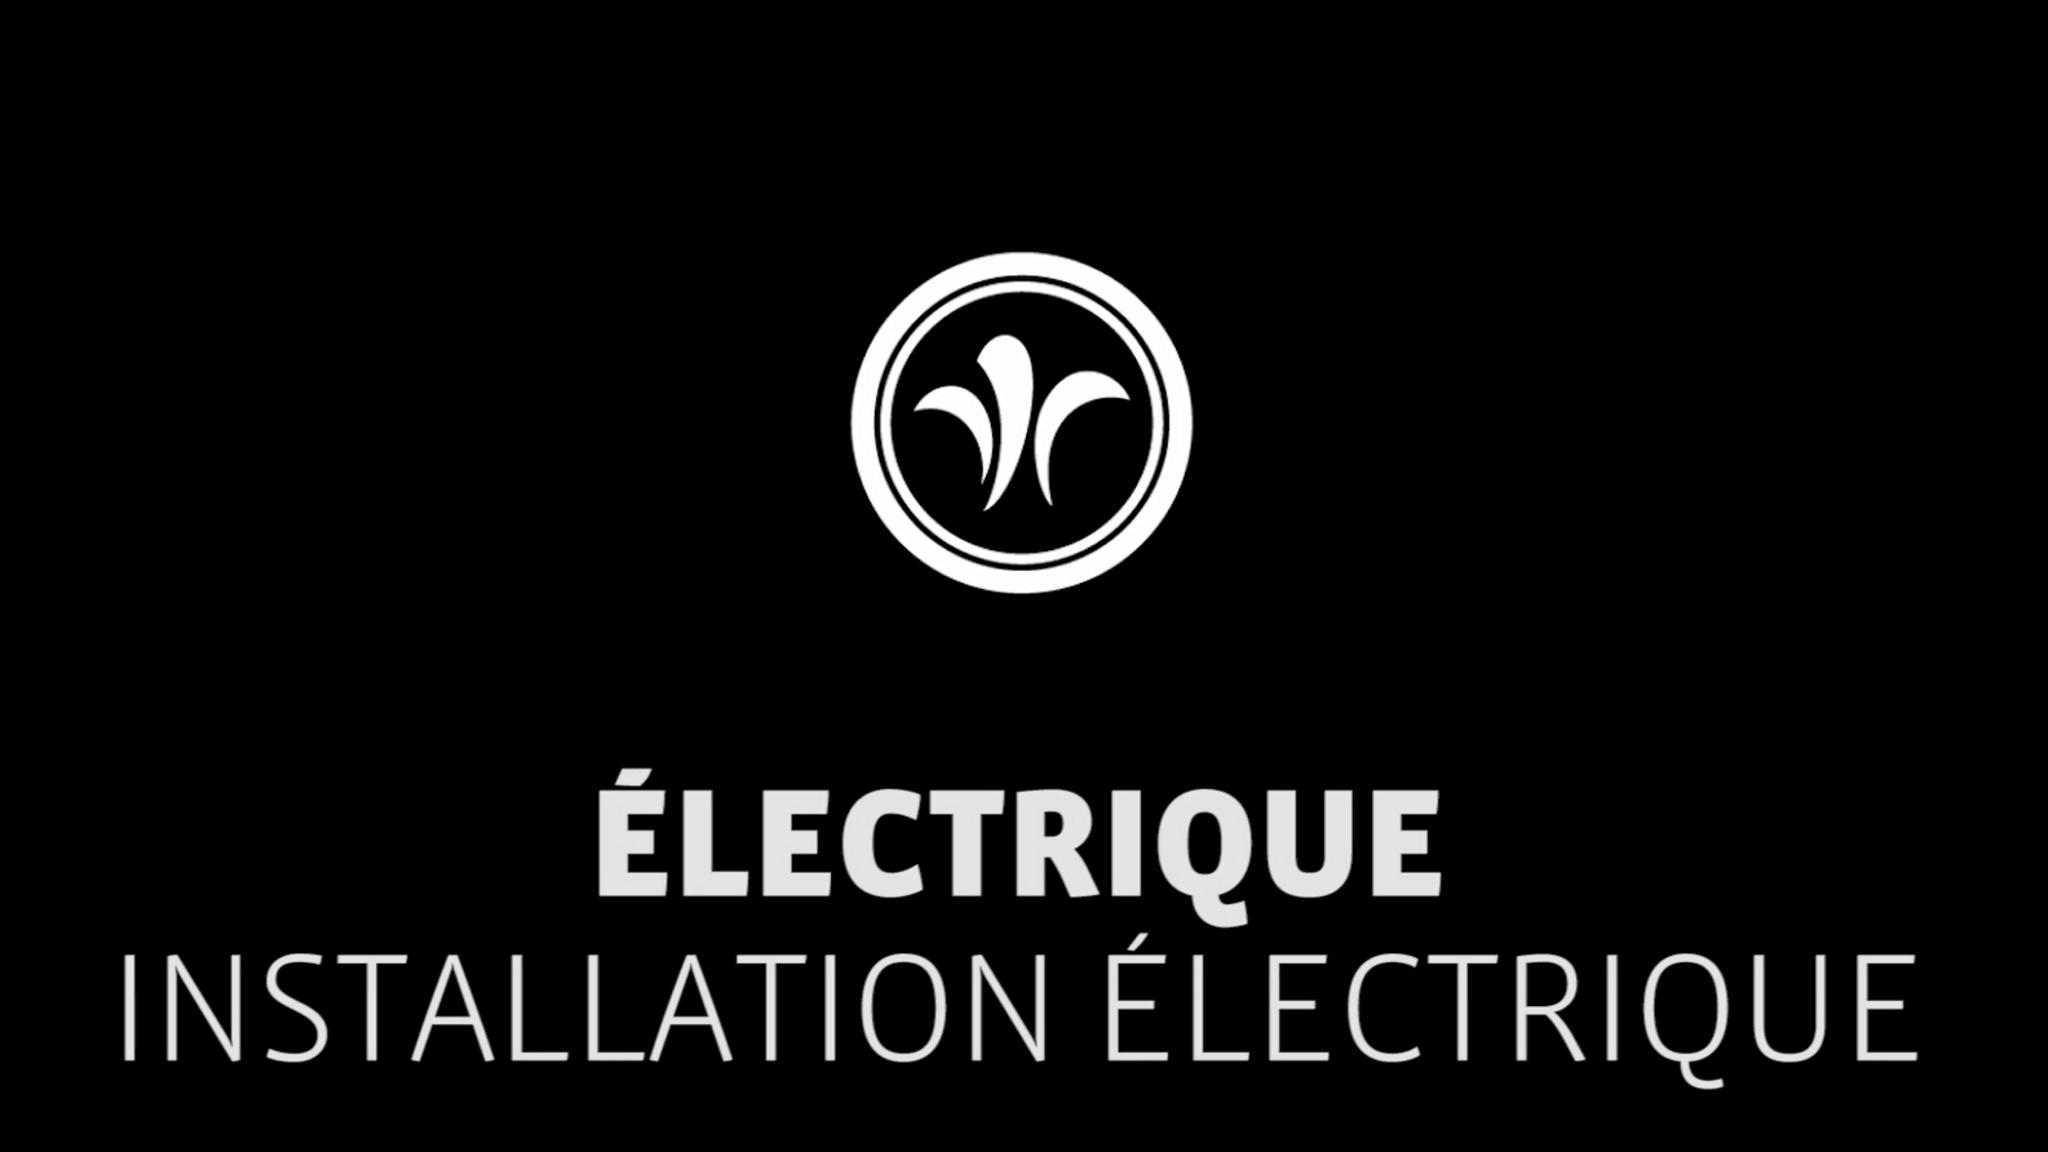 Installation électrique pour camping-cars // Niesmann+Bischoff - Camping-car (FLAIR) // 2019 // EL8